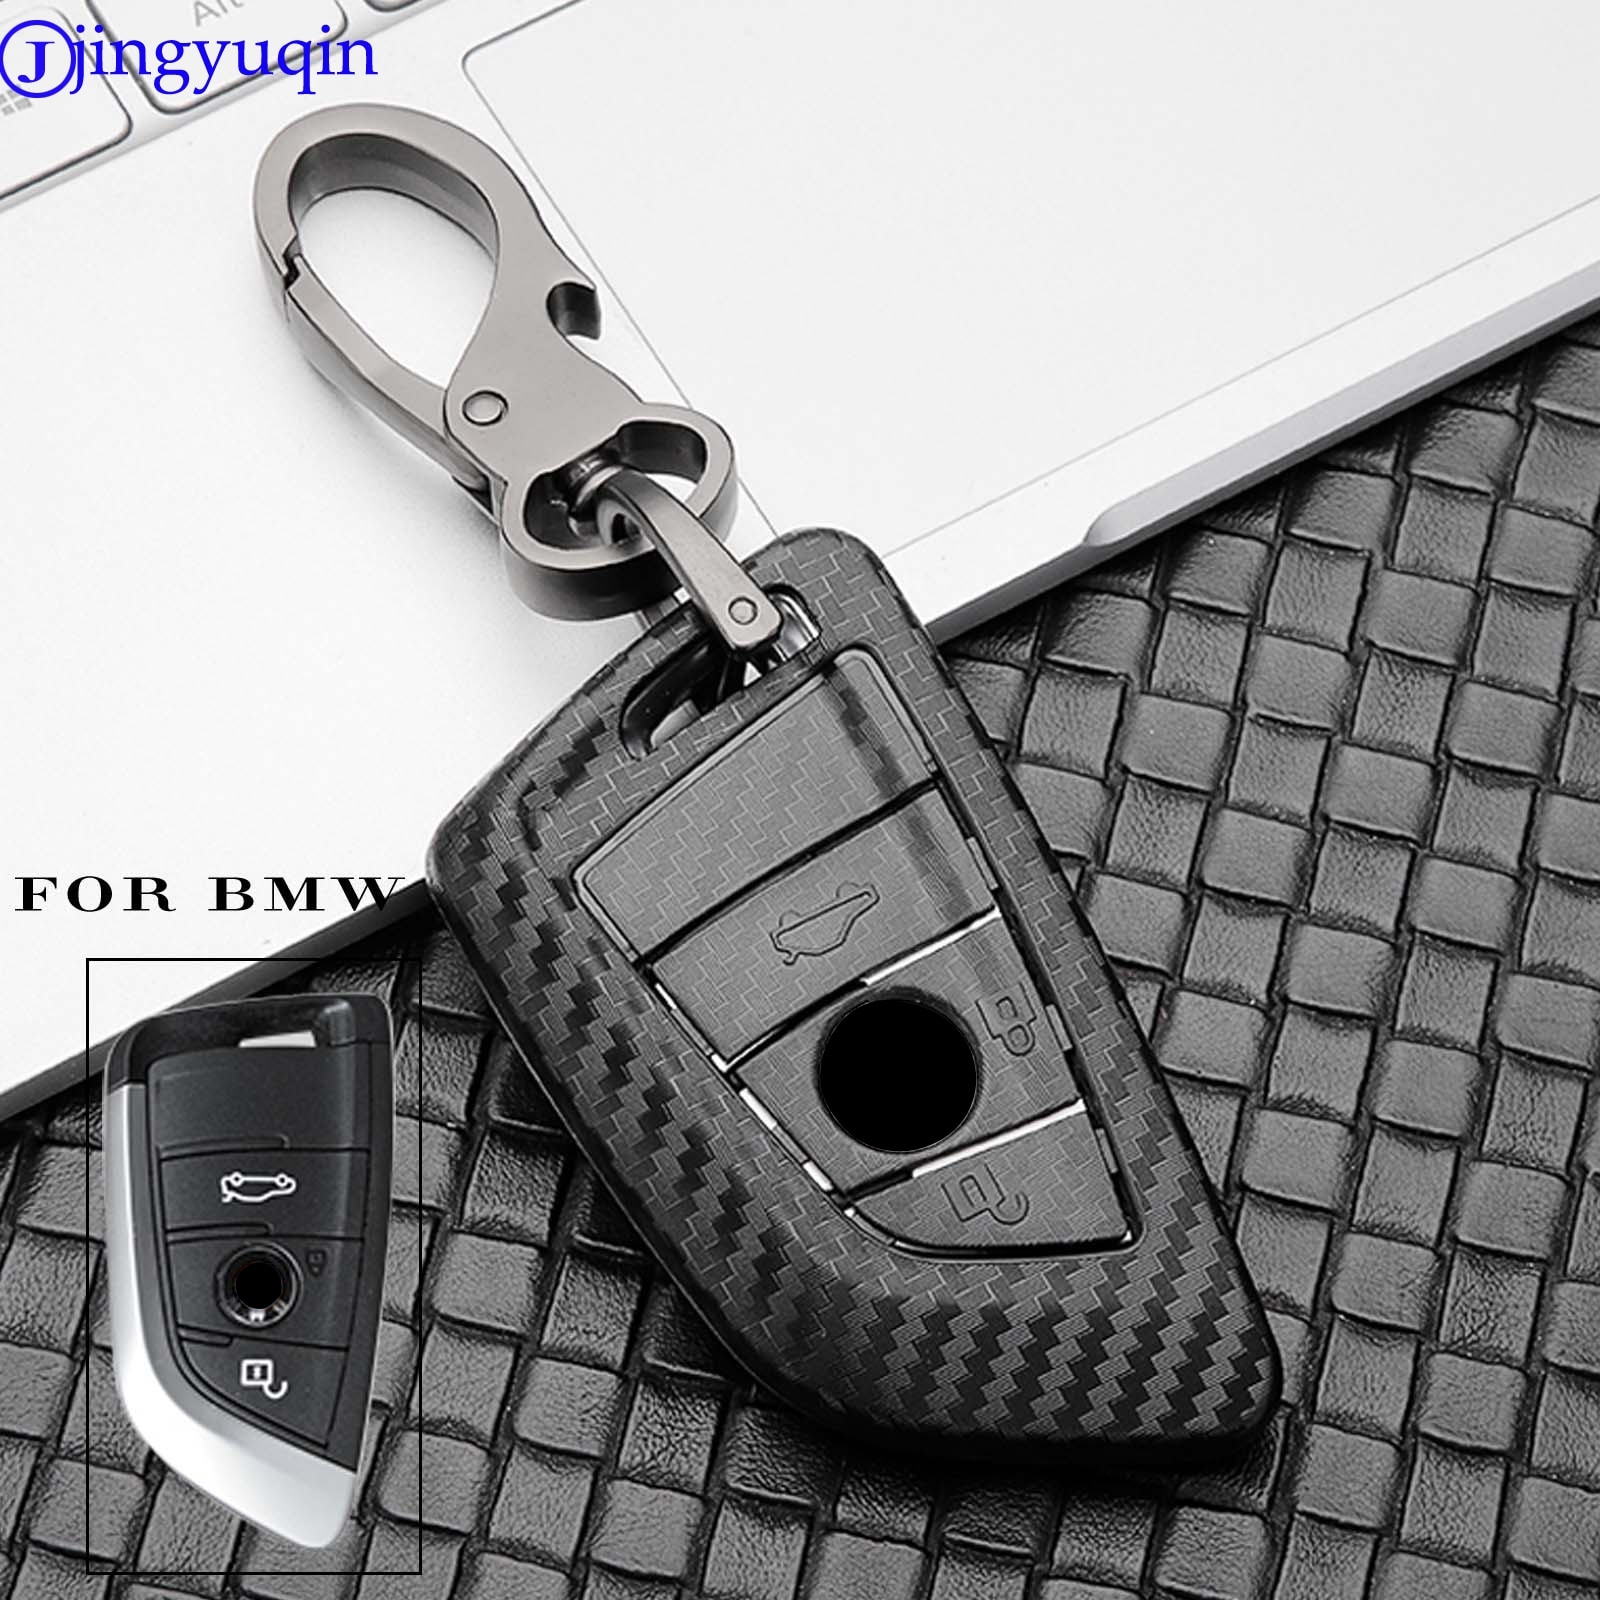 jingyuqin ABS+Carbon for BMW CAS4 F 3 5 7  E90 E92 E93 X5 CAS1 2 3 4 5 6 7 X5 X6 + FEM Car Key Case Keychain Cover Procted